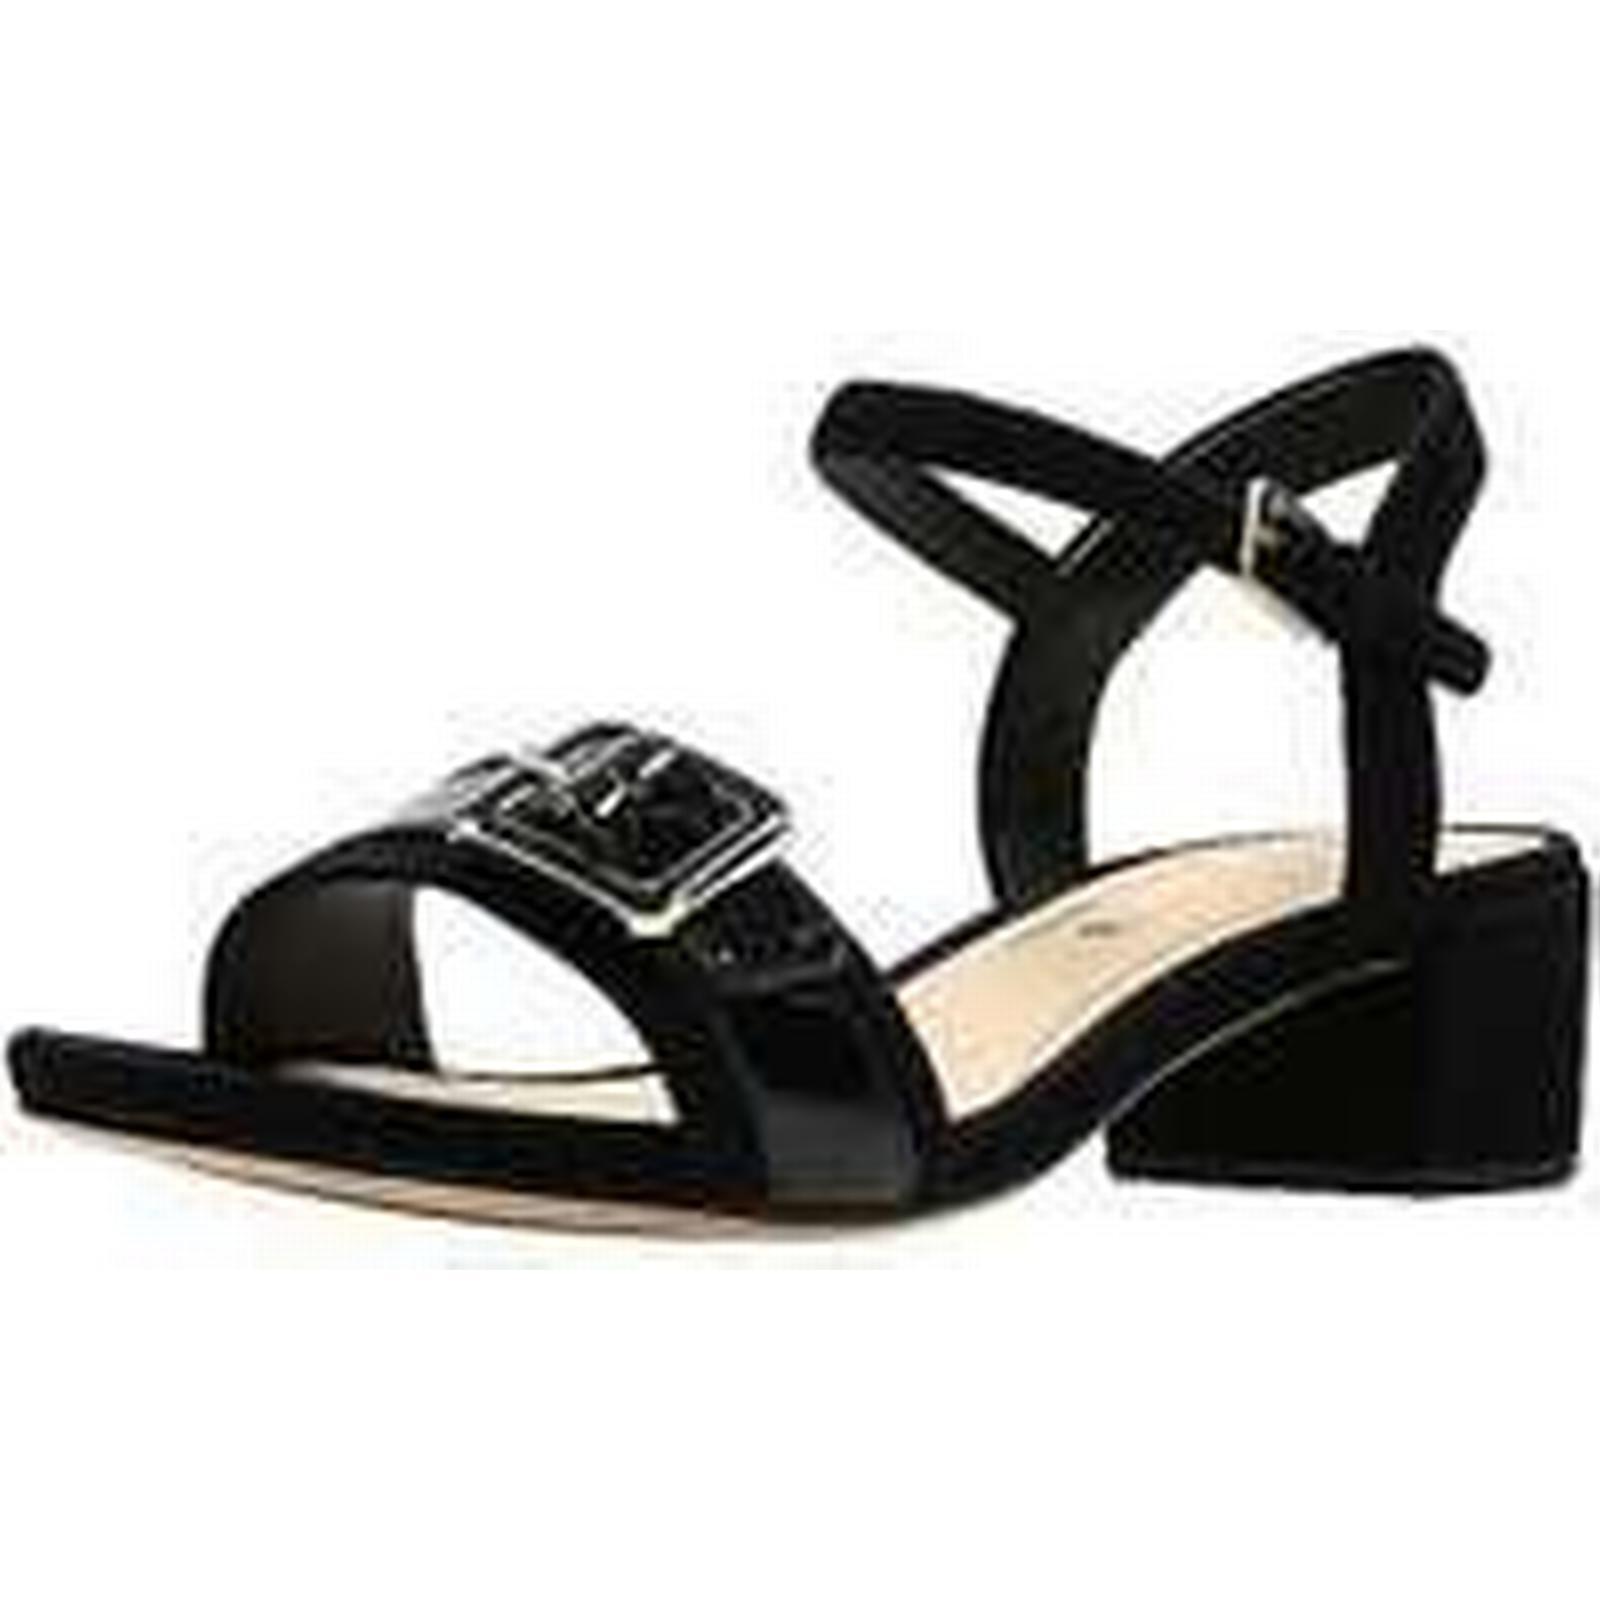 Clarks Black Low Heel Buckle Sandals Clarks by Clarks Sandals d0a7e3